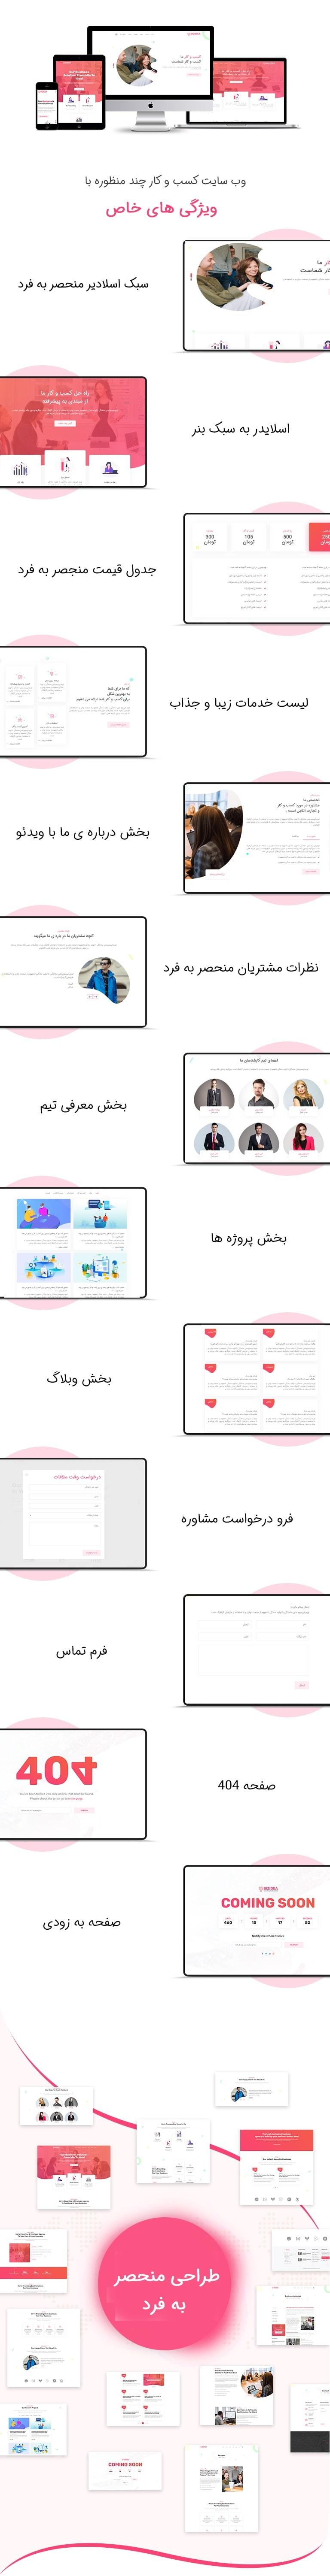 قالب Bizidea پوسته HTML سایت چند منظوره کسب و کار